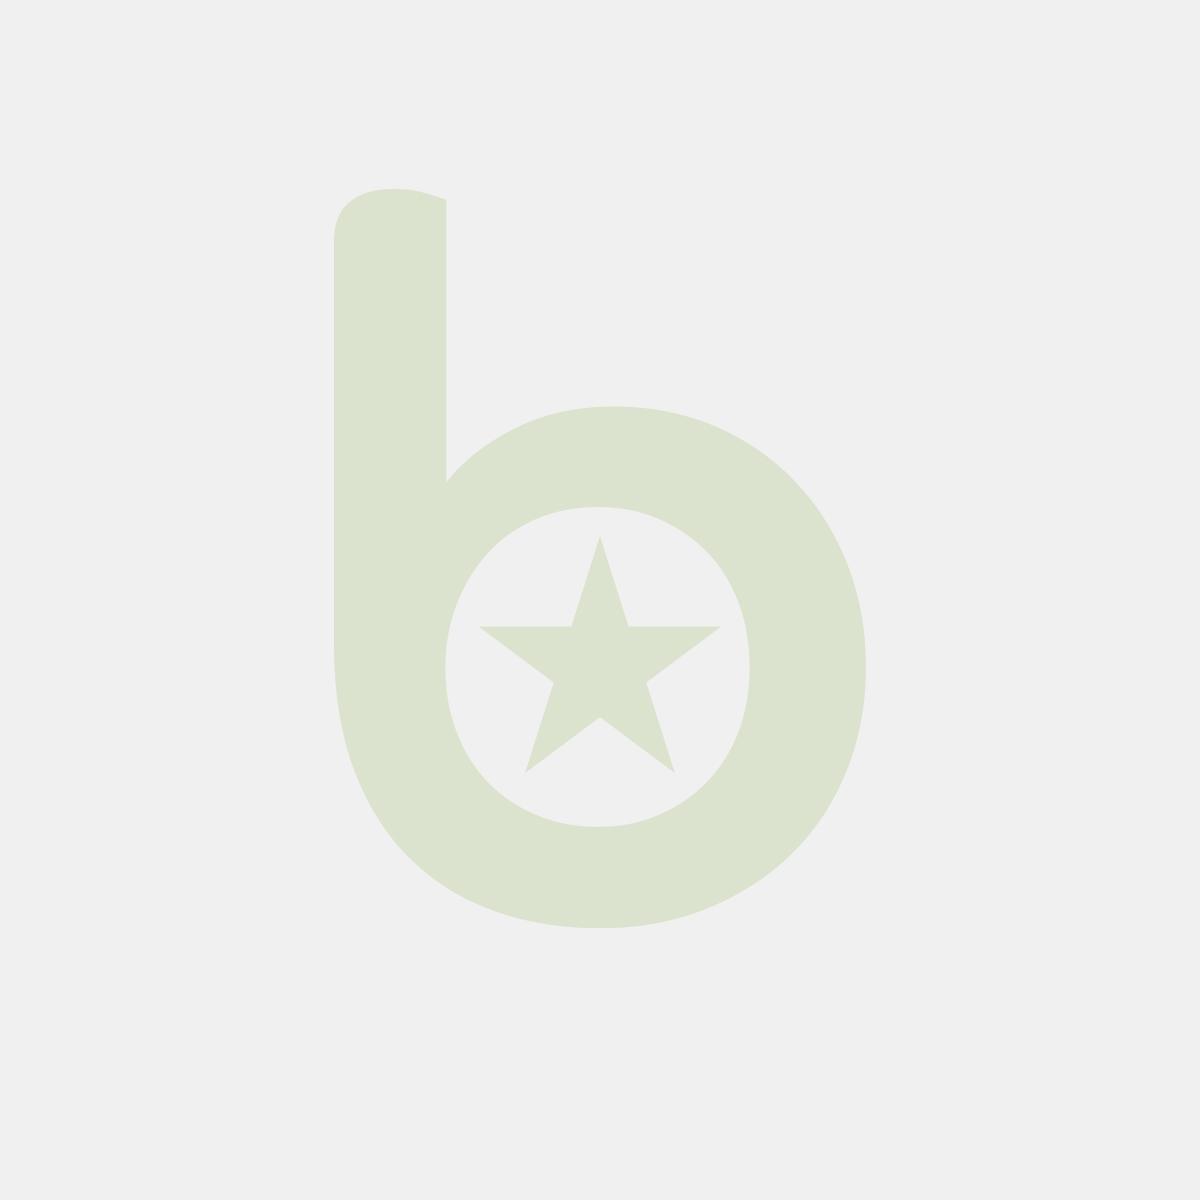 Zakaz palenia tytoniu B2 - 105 x 105mm GP002B2FN